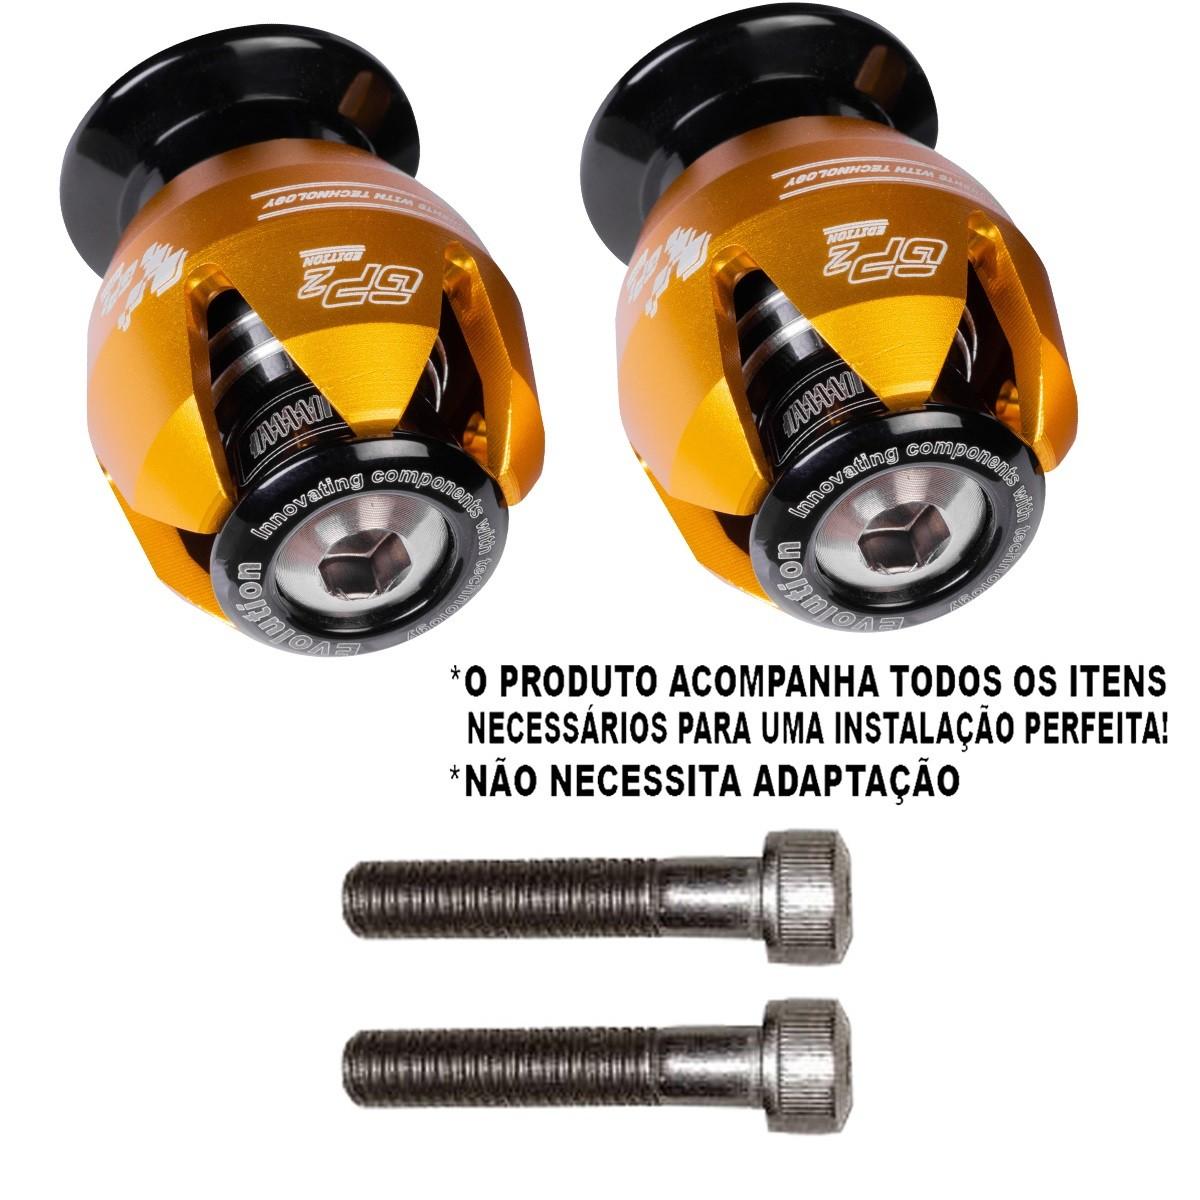 Slider traseiro bandit 1250 2014 2015 2016 2017 2018 2019 balança suzuki gp2 edition